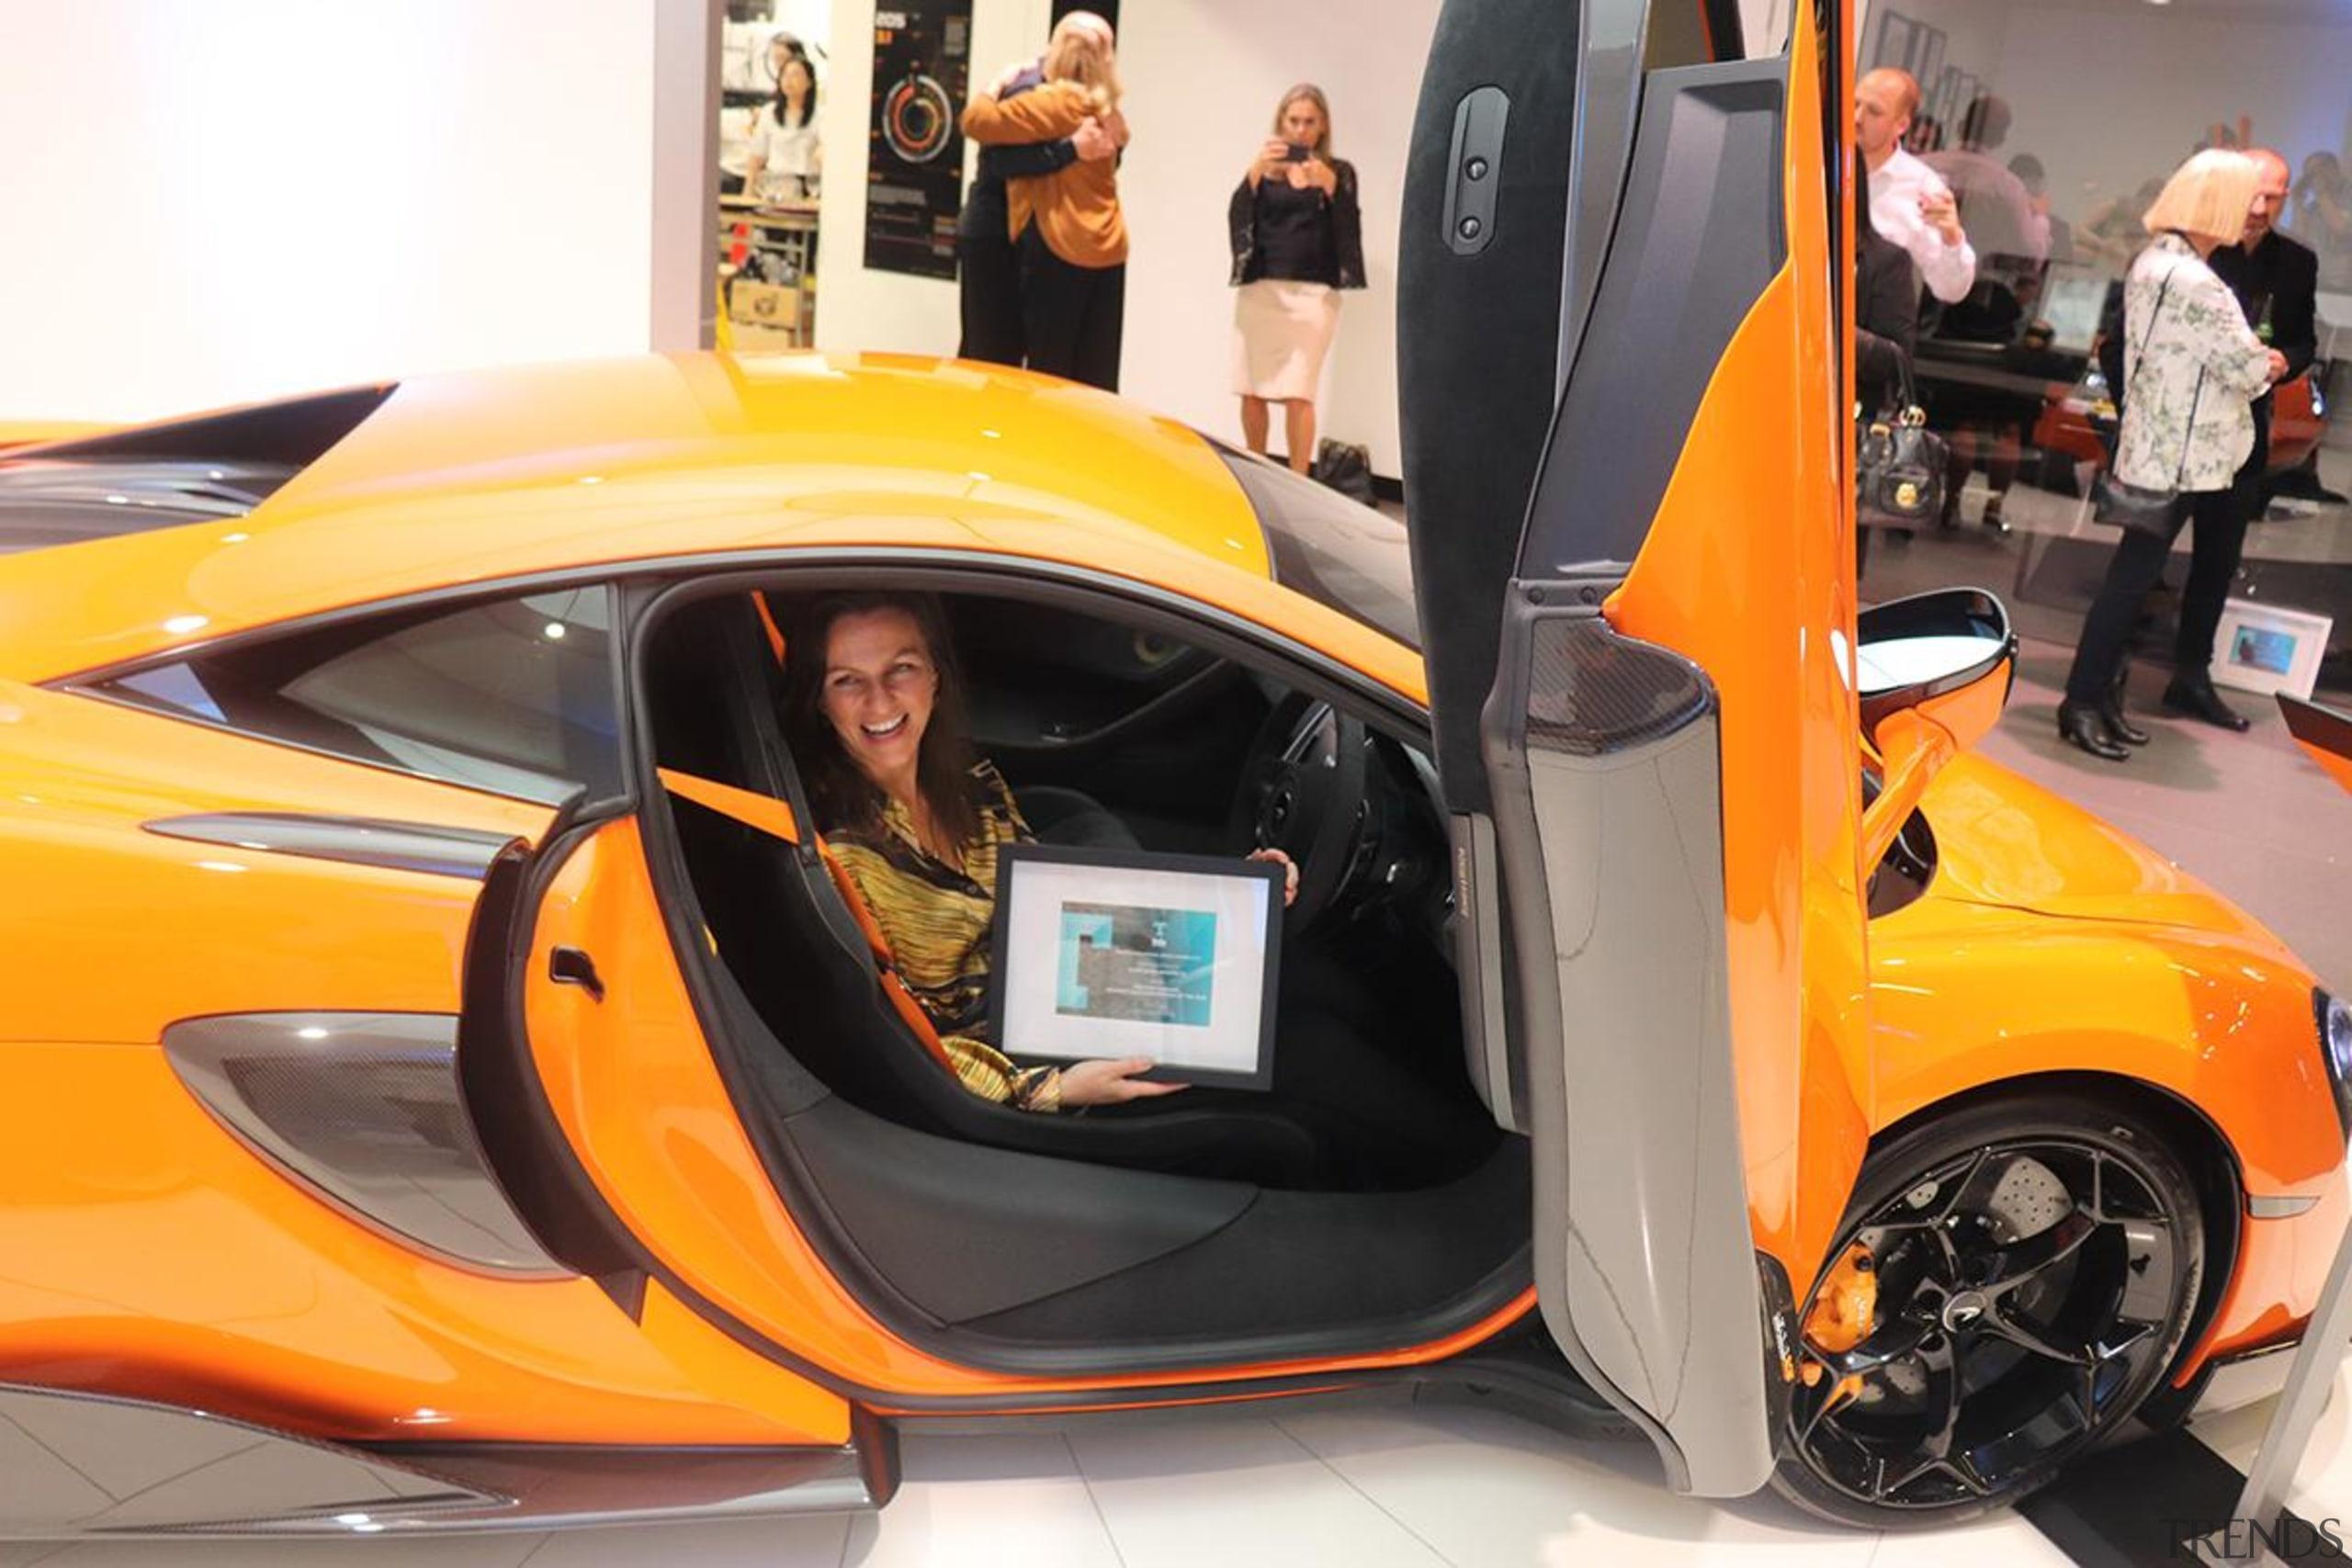 Eliska Lewis - auto show | automotive design auto show, automotive design, car, concept car, land vehicle, mclaren automotive, mclaren mp4-12c, mclaren p1, sports car, supercar, vehicle, vehicle door, orange, black